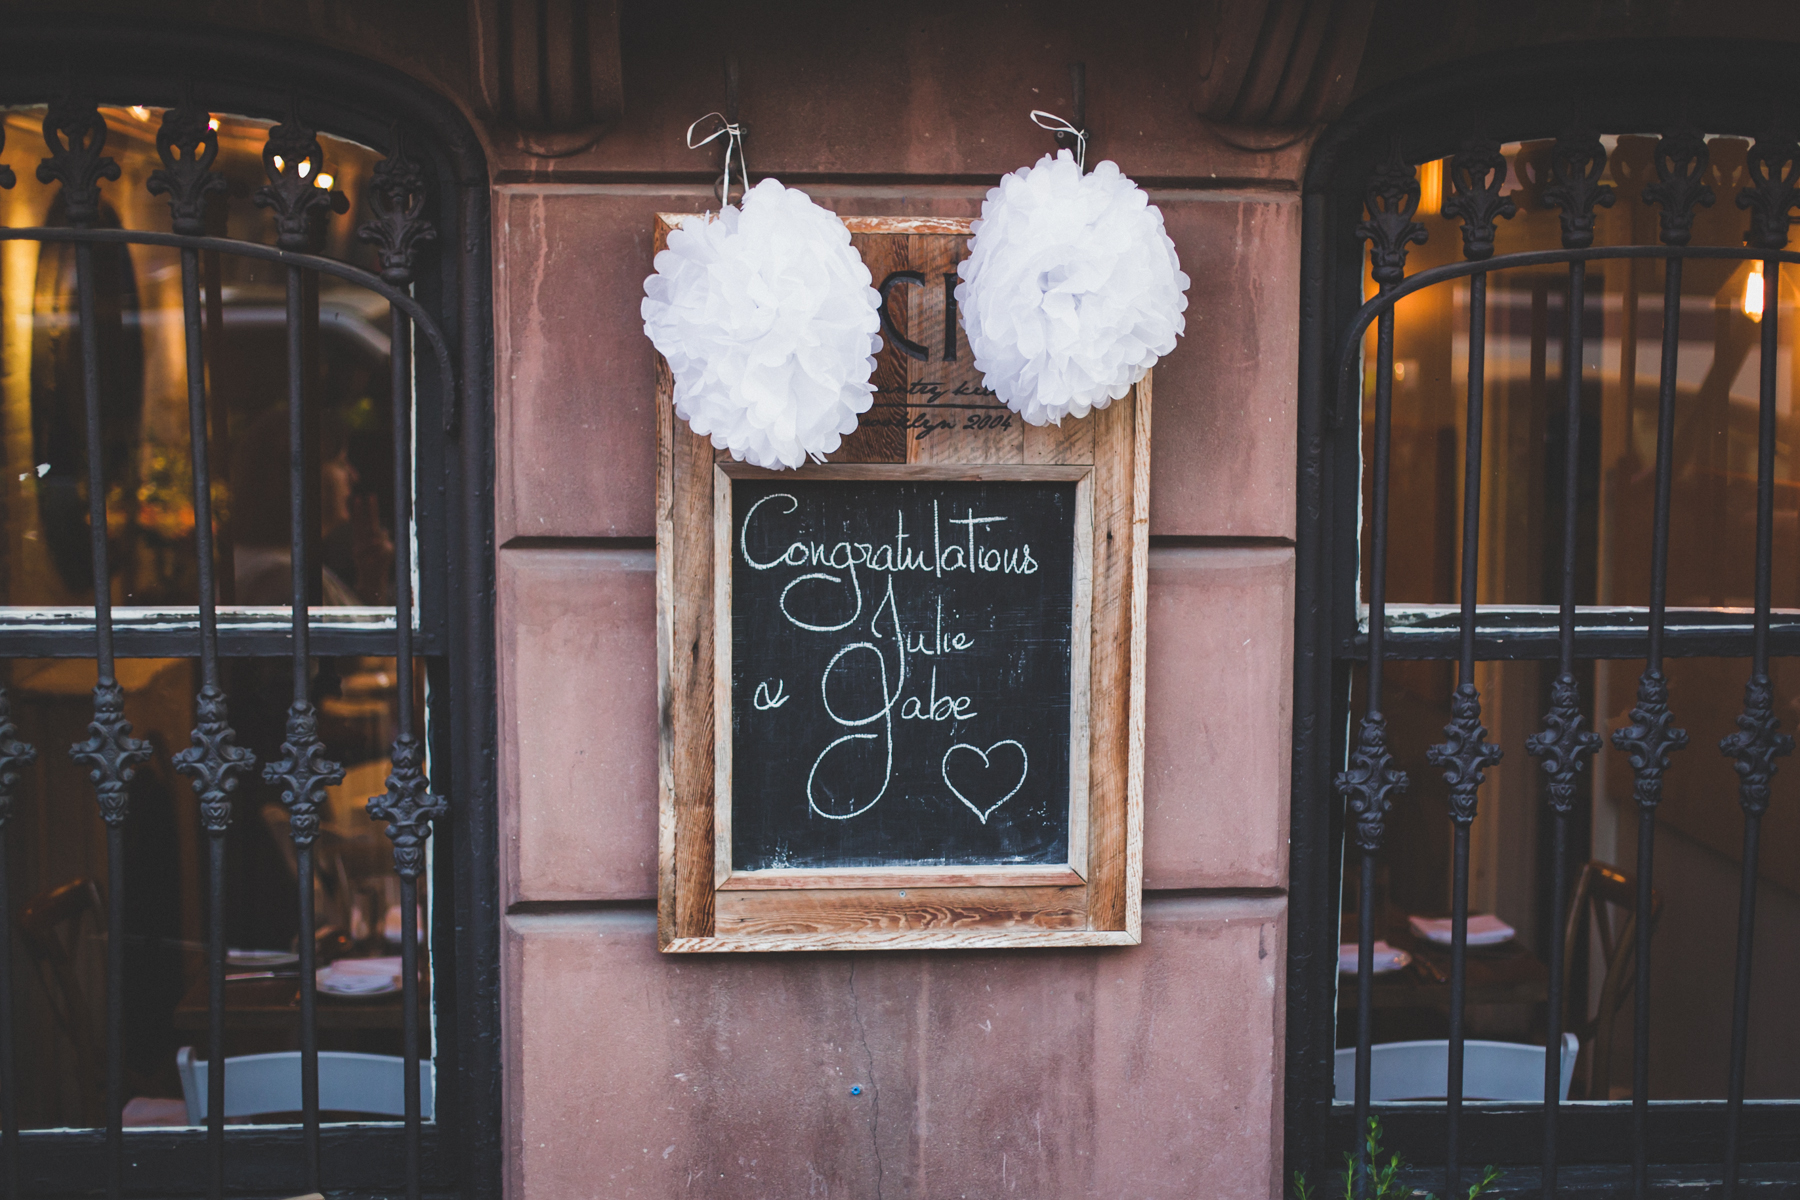 ICI-Restaurant-Fort-Greene-Brooklyn-Intimate-Documentary-Wedding-Photography-Elvira-Kalviste-68.jpg